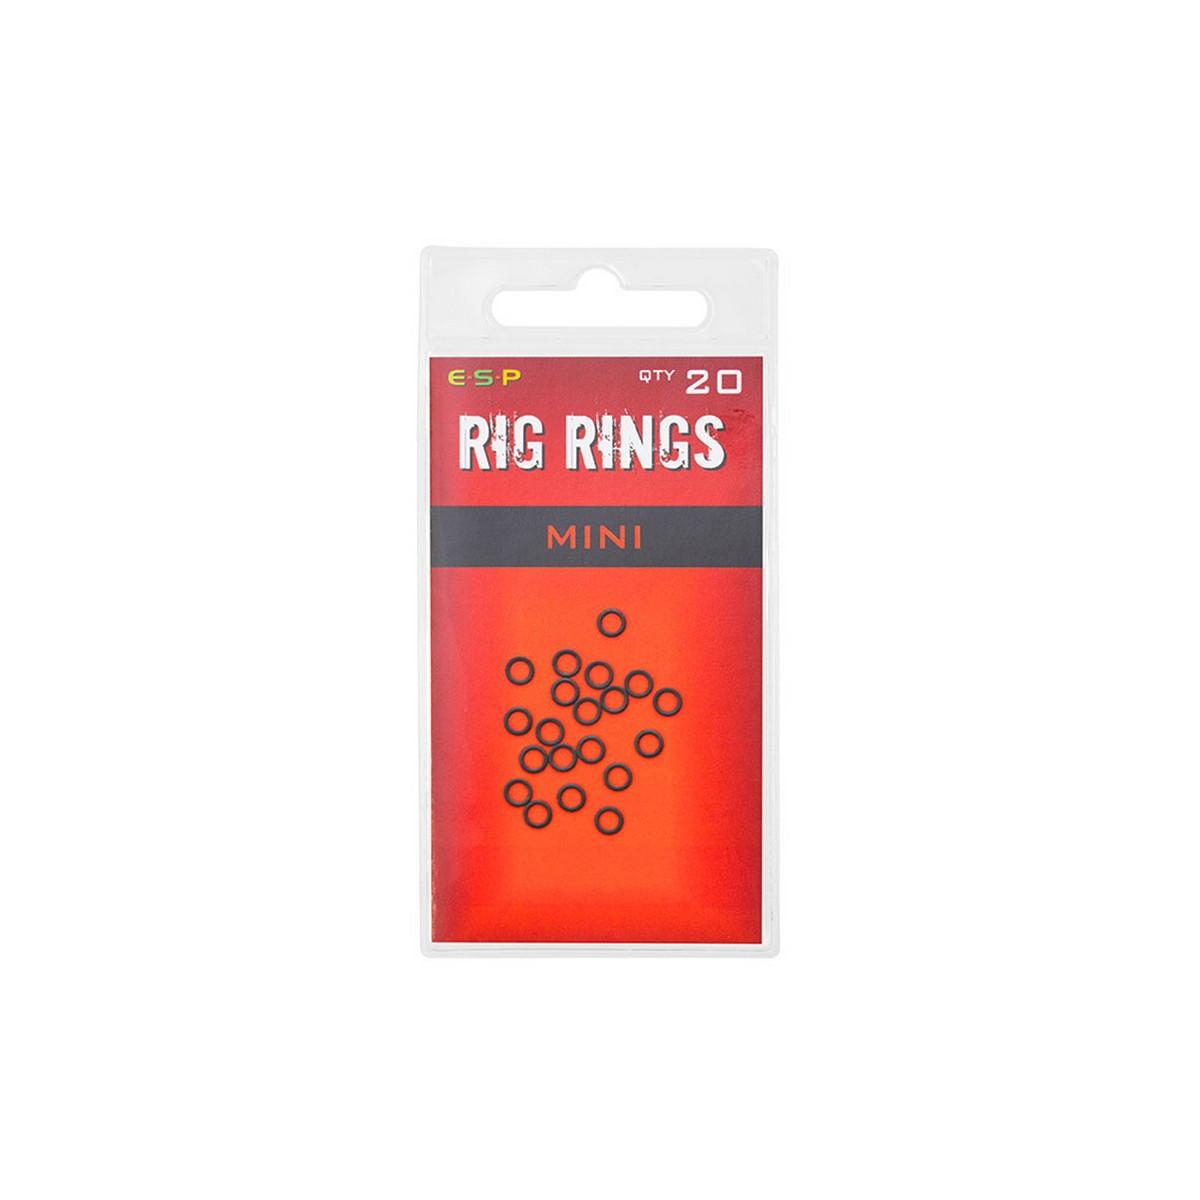 ESP RIG RINGS - MINI - CSALIGYÛRÛ 20DB